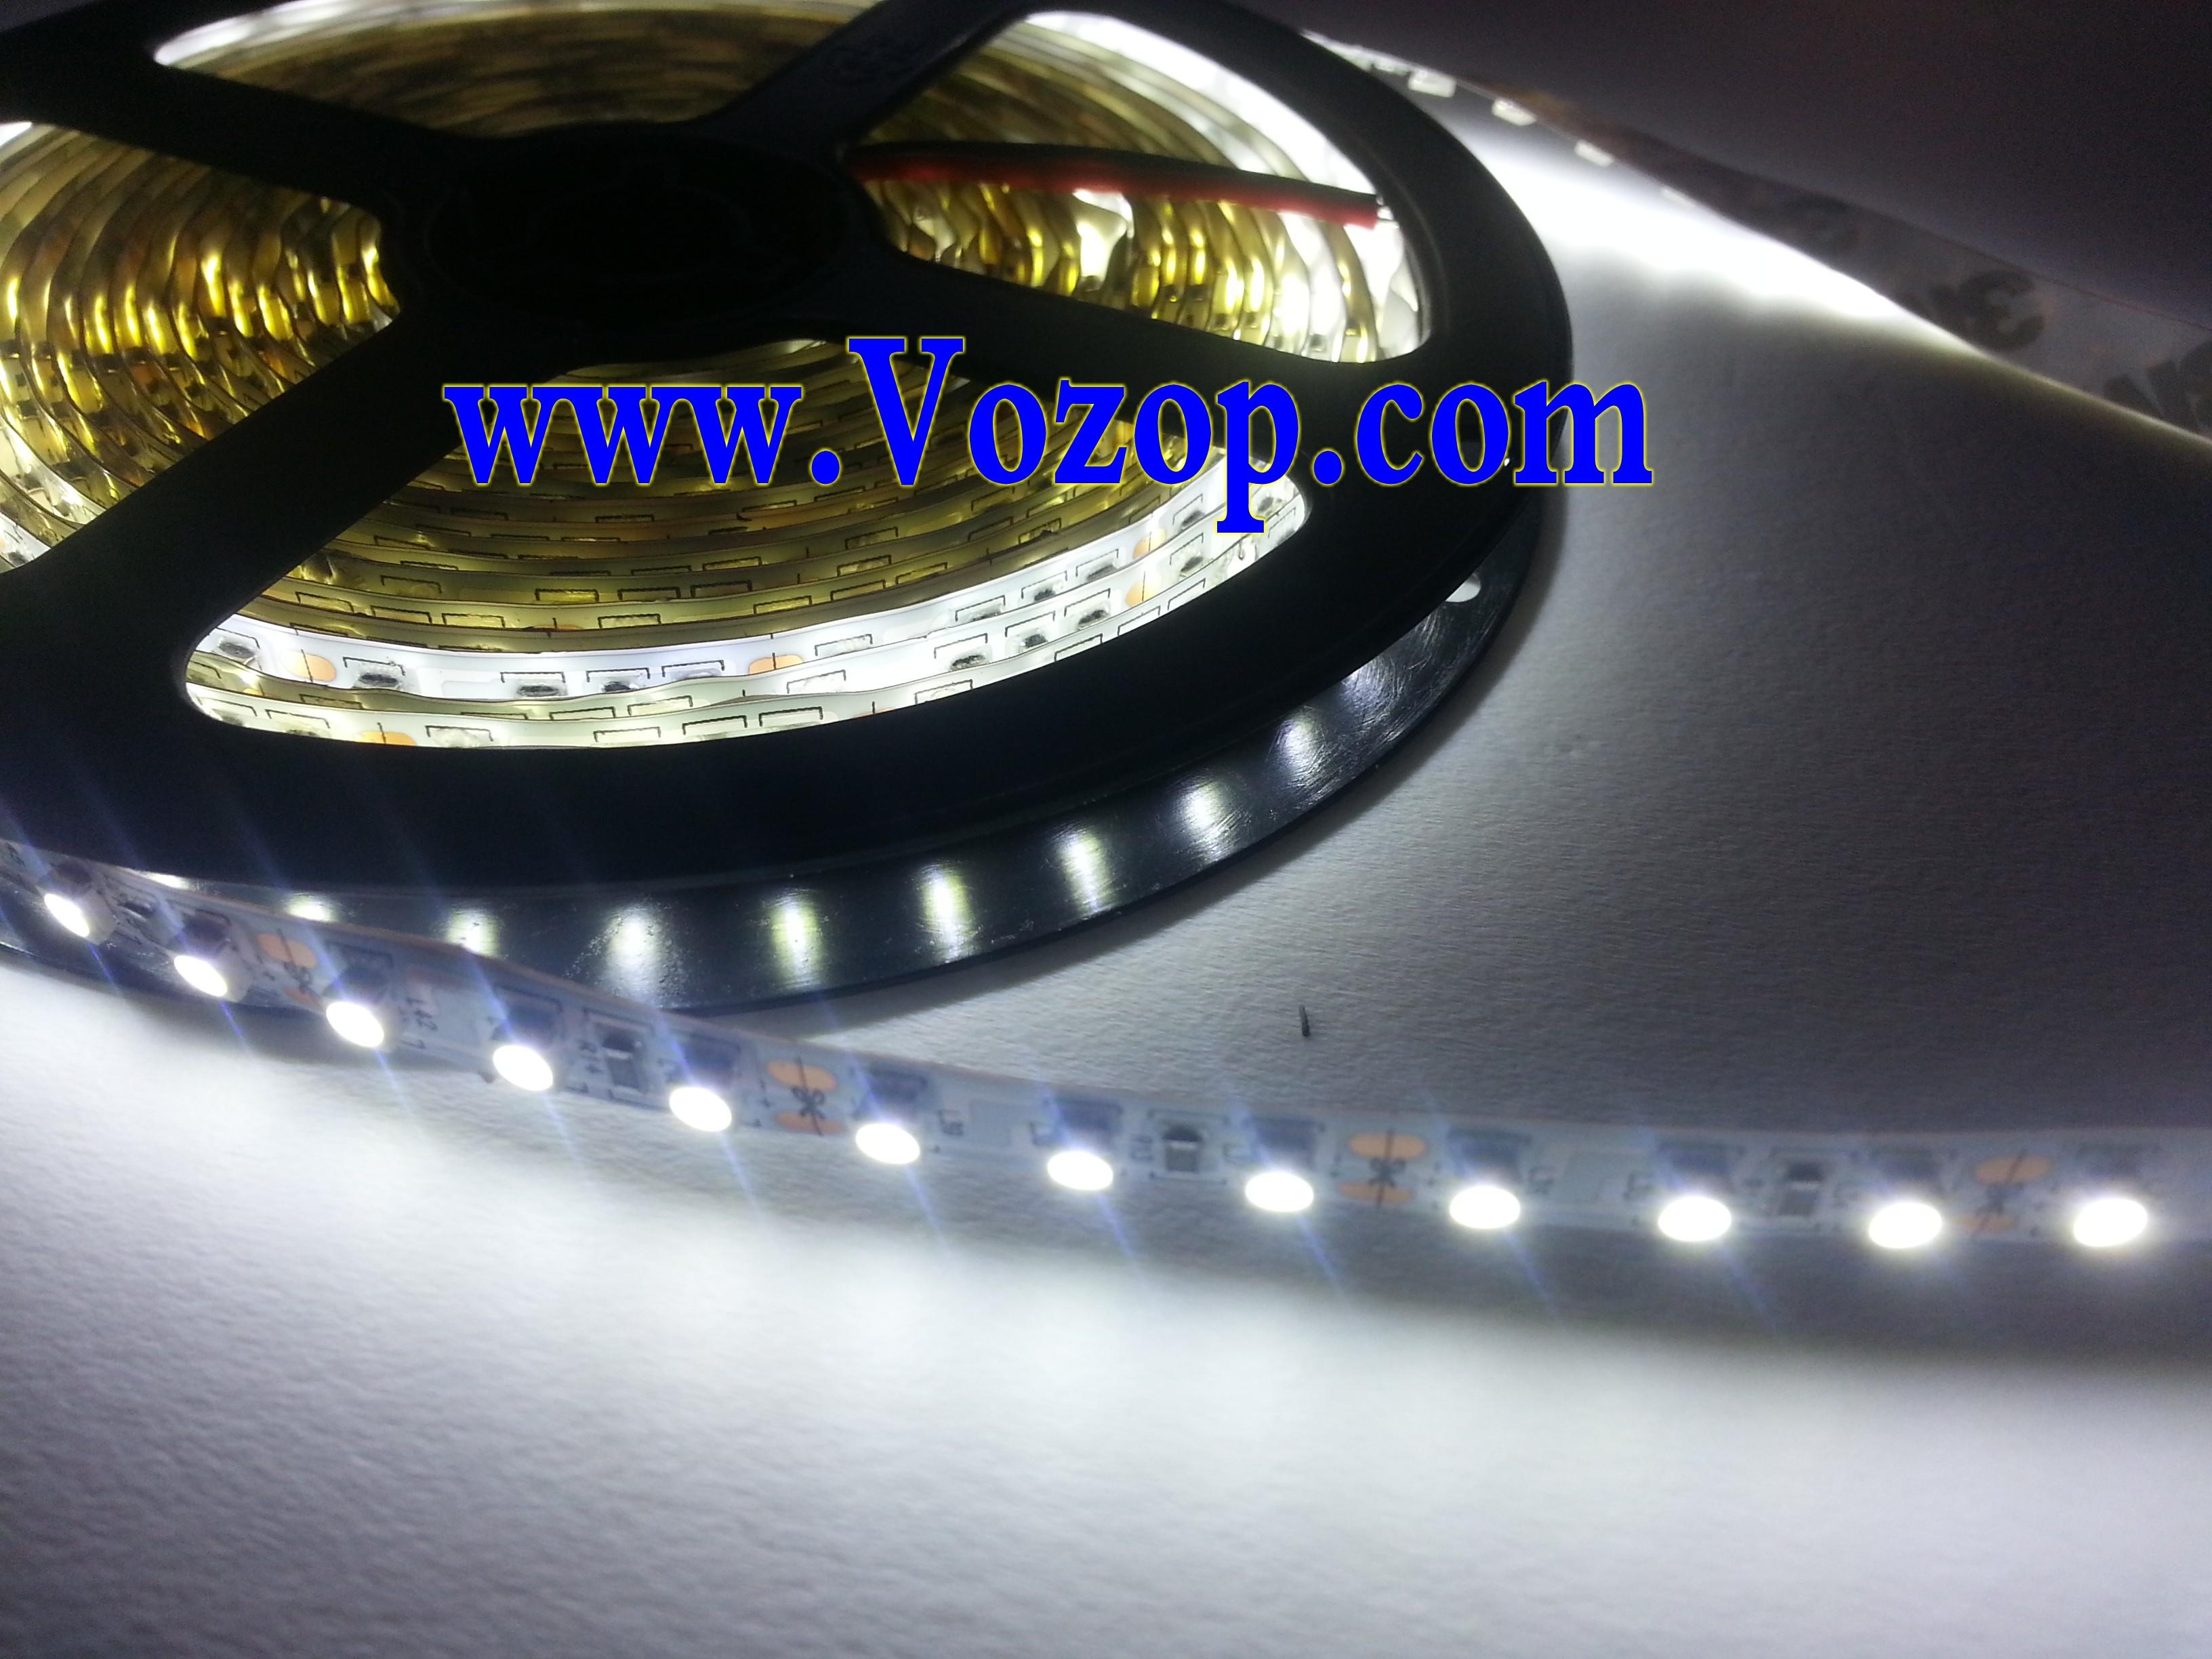 pure_White_3528_LED_Strip_light_5M_600_LEDs_Non_Waterproof_Light